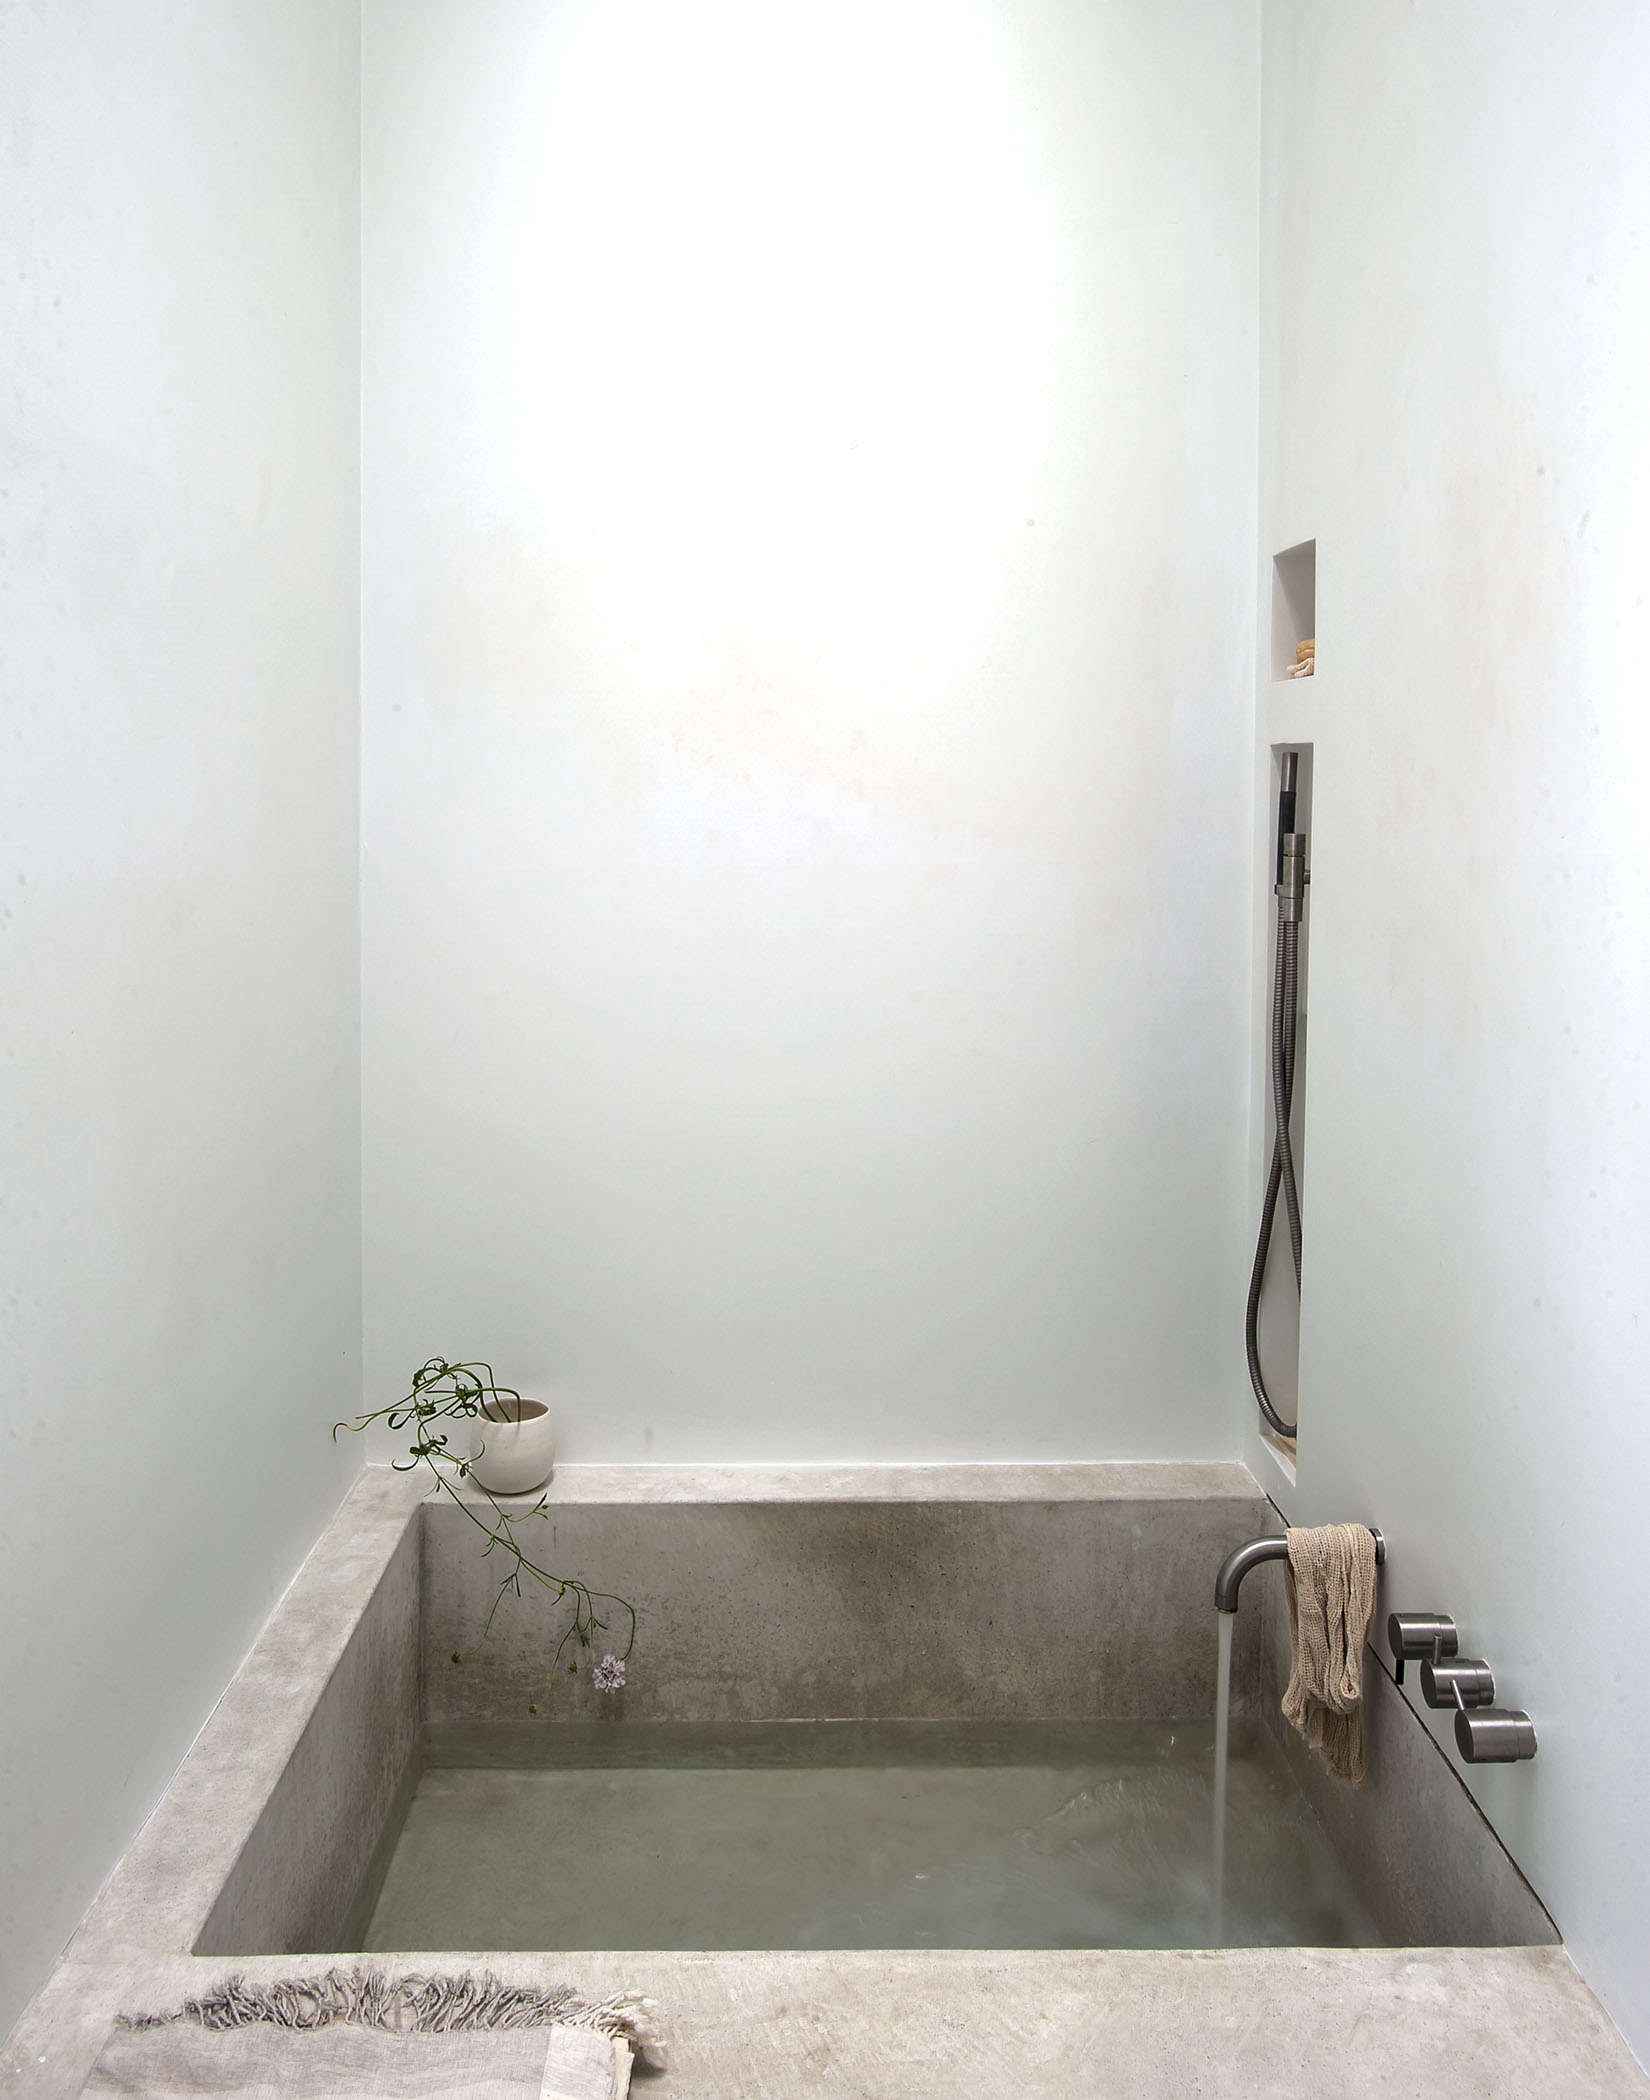 Tiny spa bath in LA by Michaela Scherrer photo by Matthew Williams   Remodelista